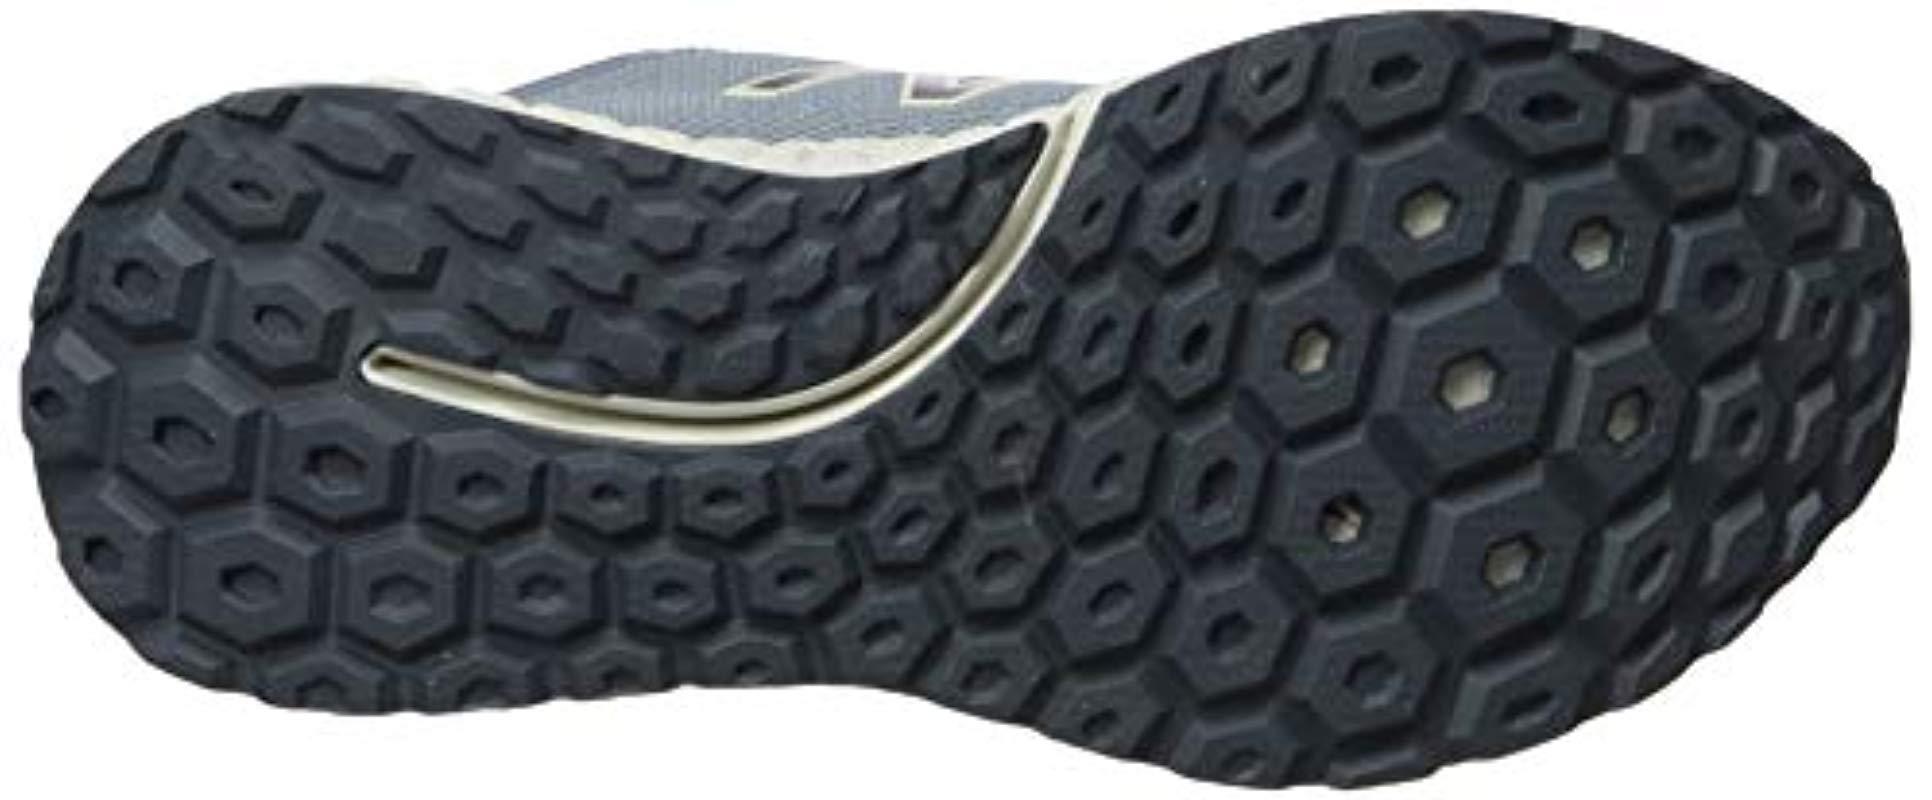 9c30d90d53517 New Balance - Blue 1165v1 Fresh Foam Walking Shoe Cyclone, 6.5 D Us - Lyst